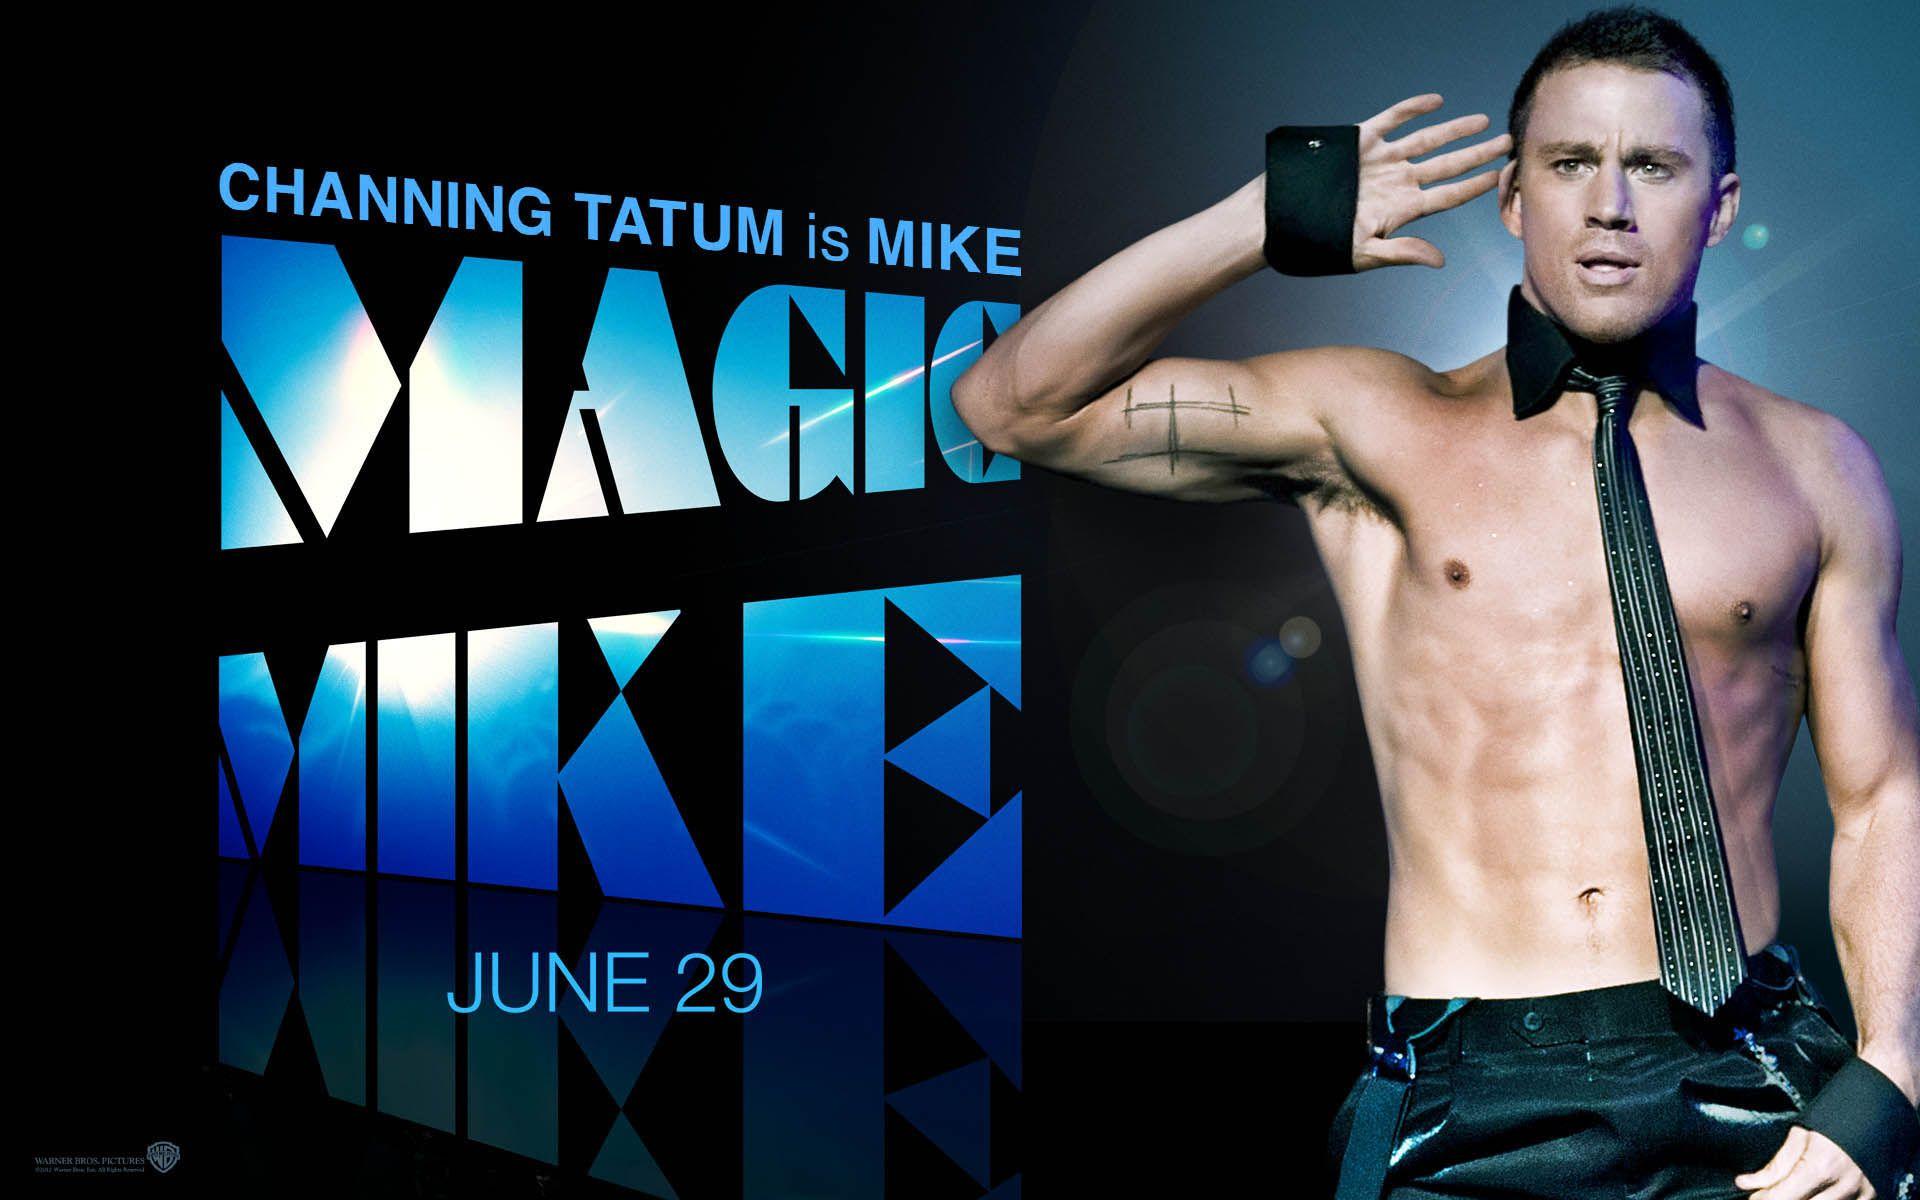 Magic Mike Wallpaper Channing Tatum Channing Tatum Magic Mike Magic Mike